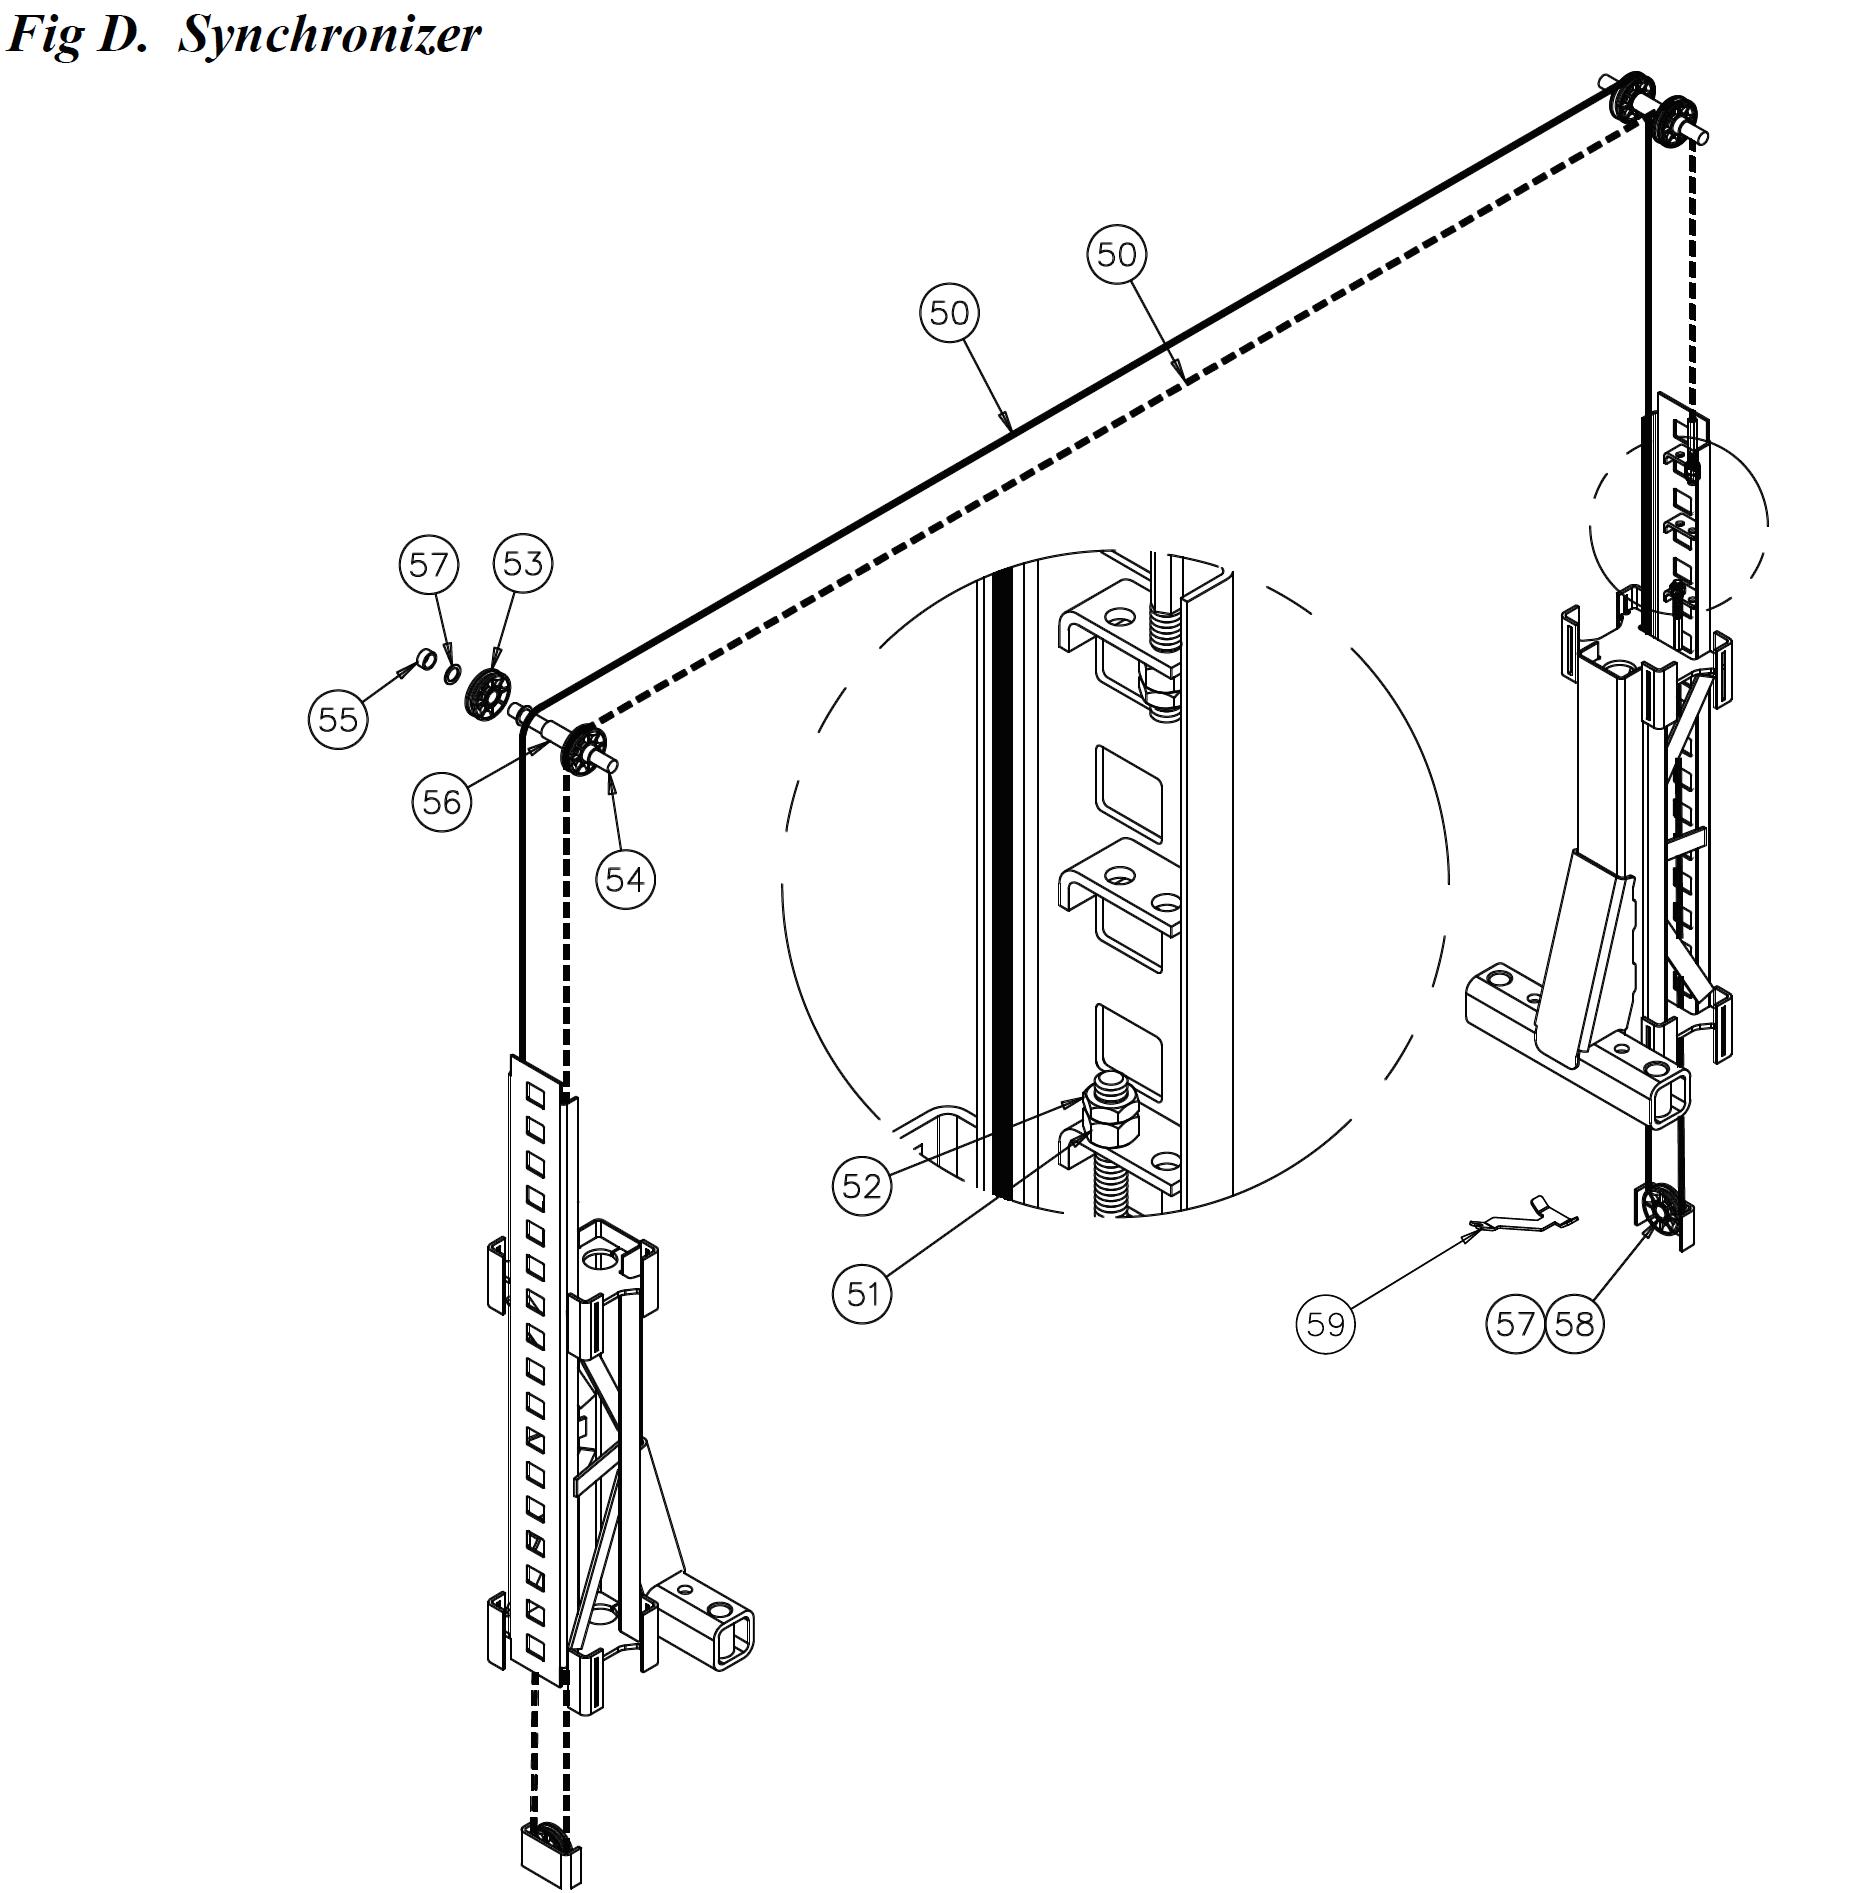 cl9-synchronizer-diagram.png